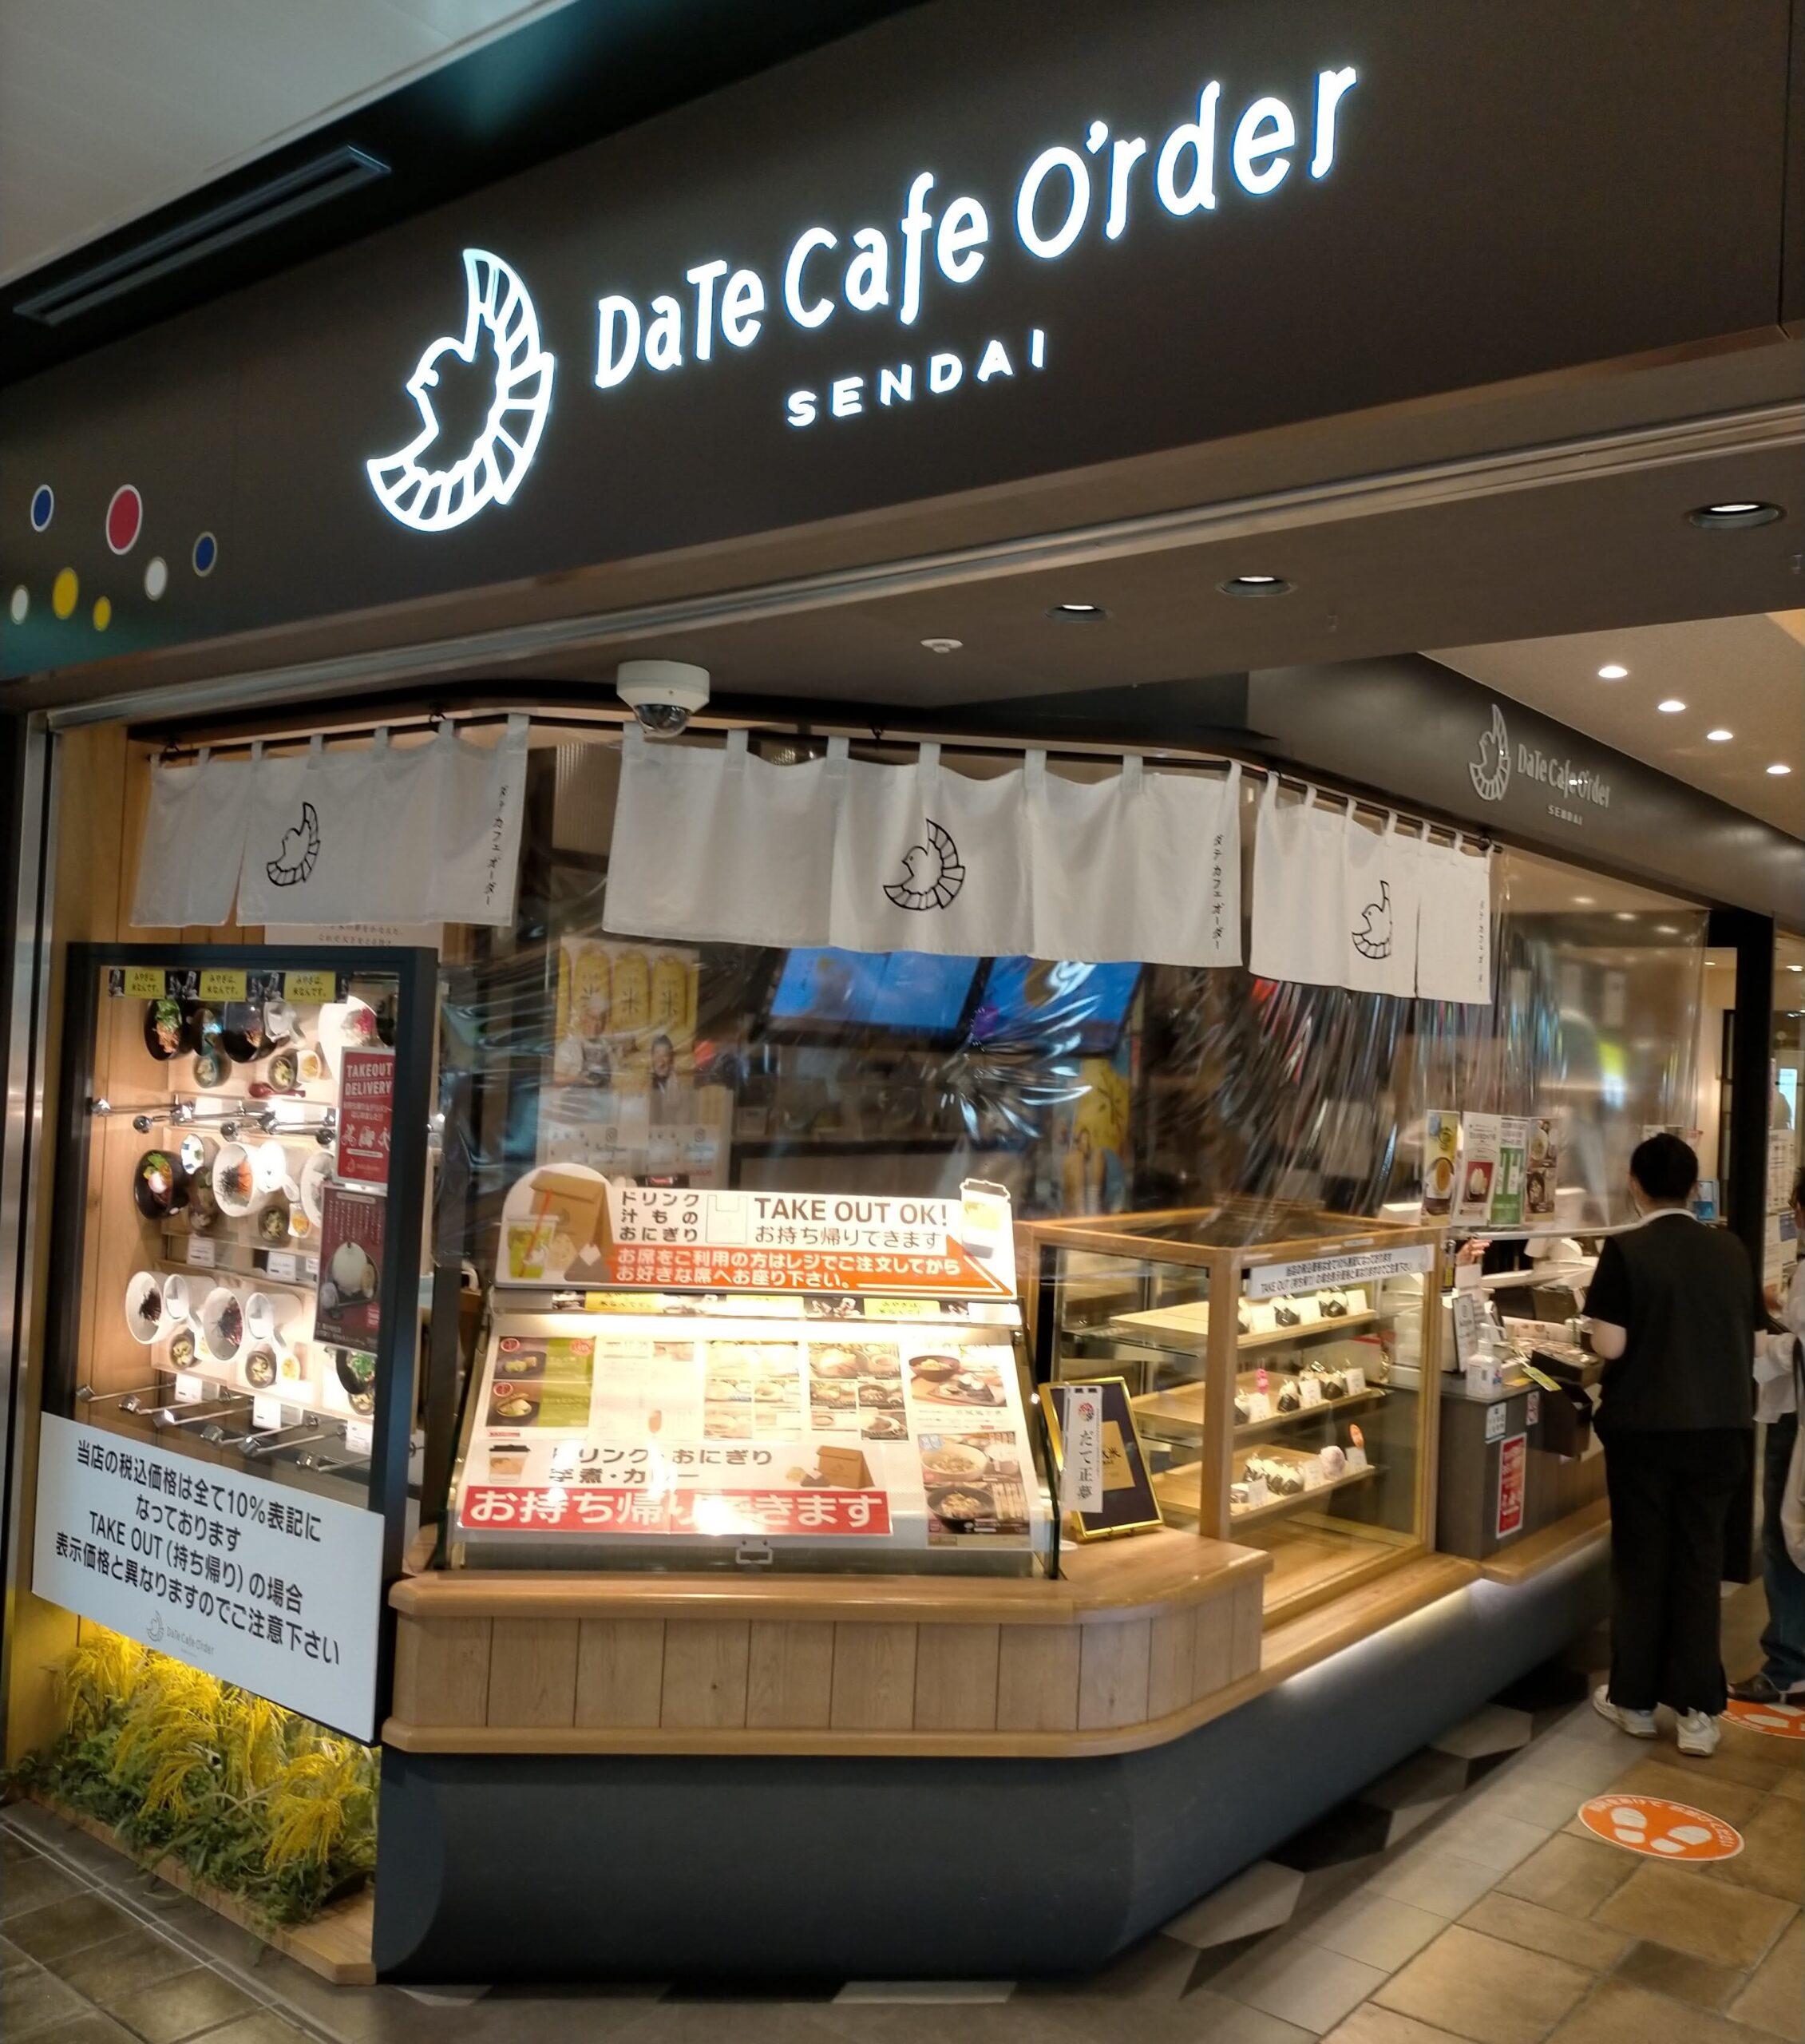 DaTe Cafe O'rder